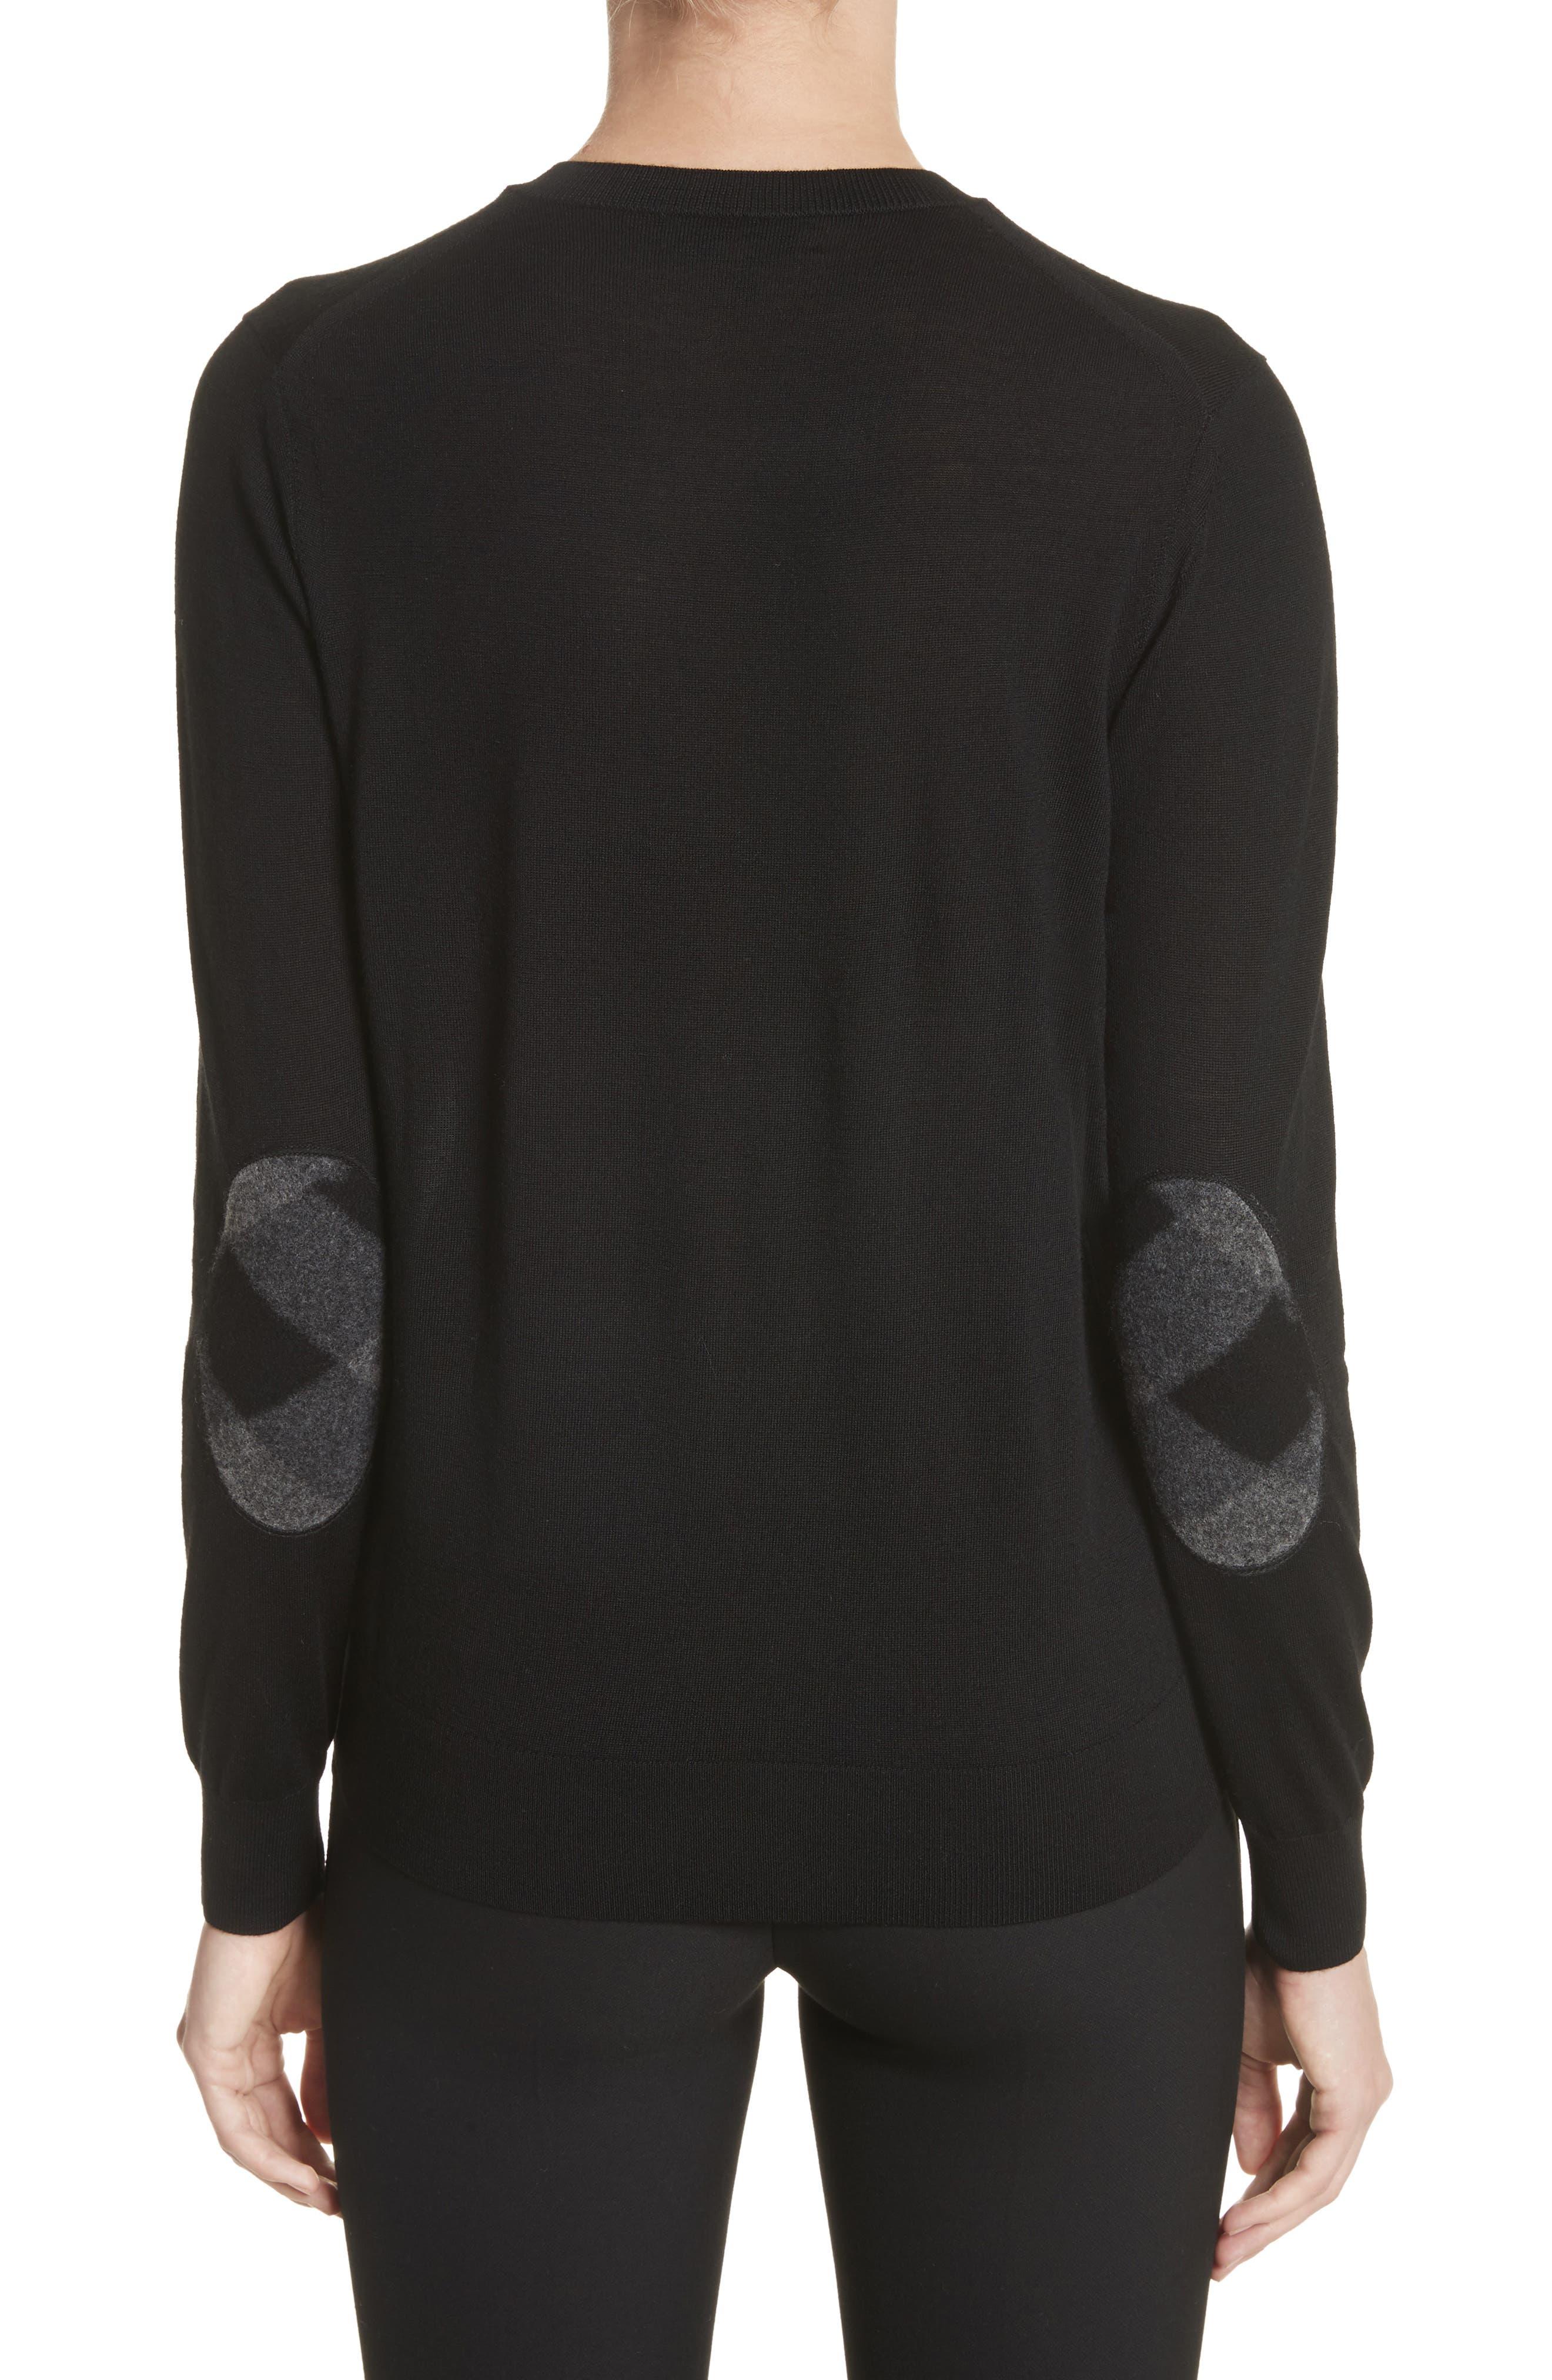 Viar Merino Wool Sweater,                             Alternate thumbnail 2, color,                             001